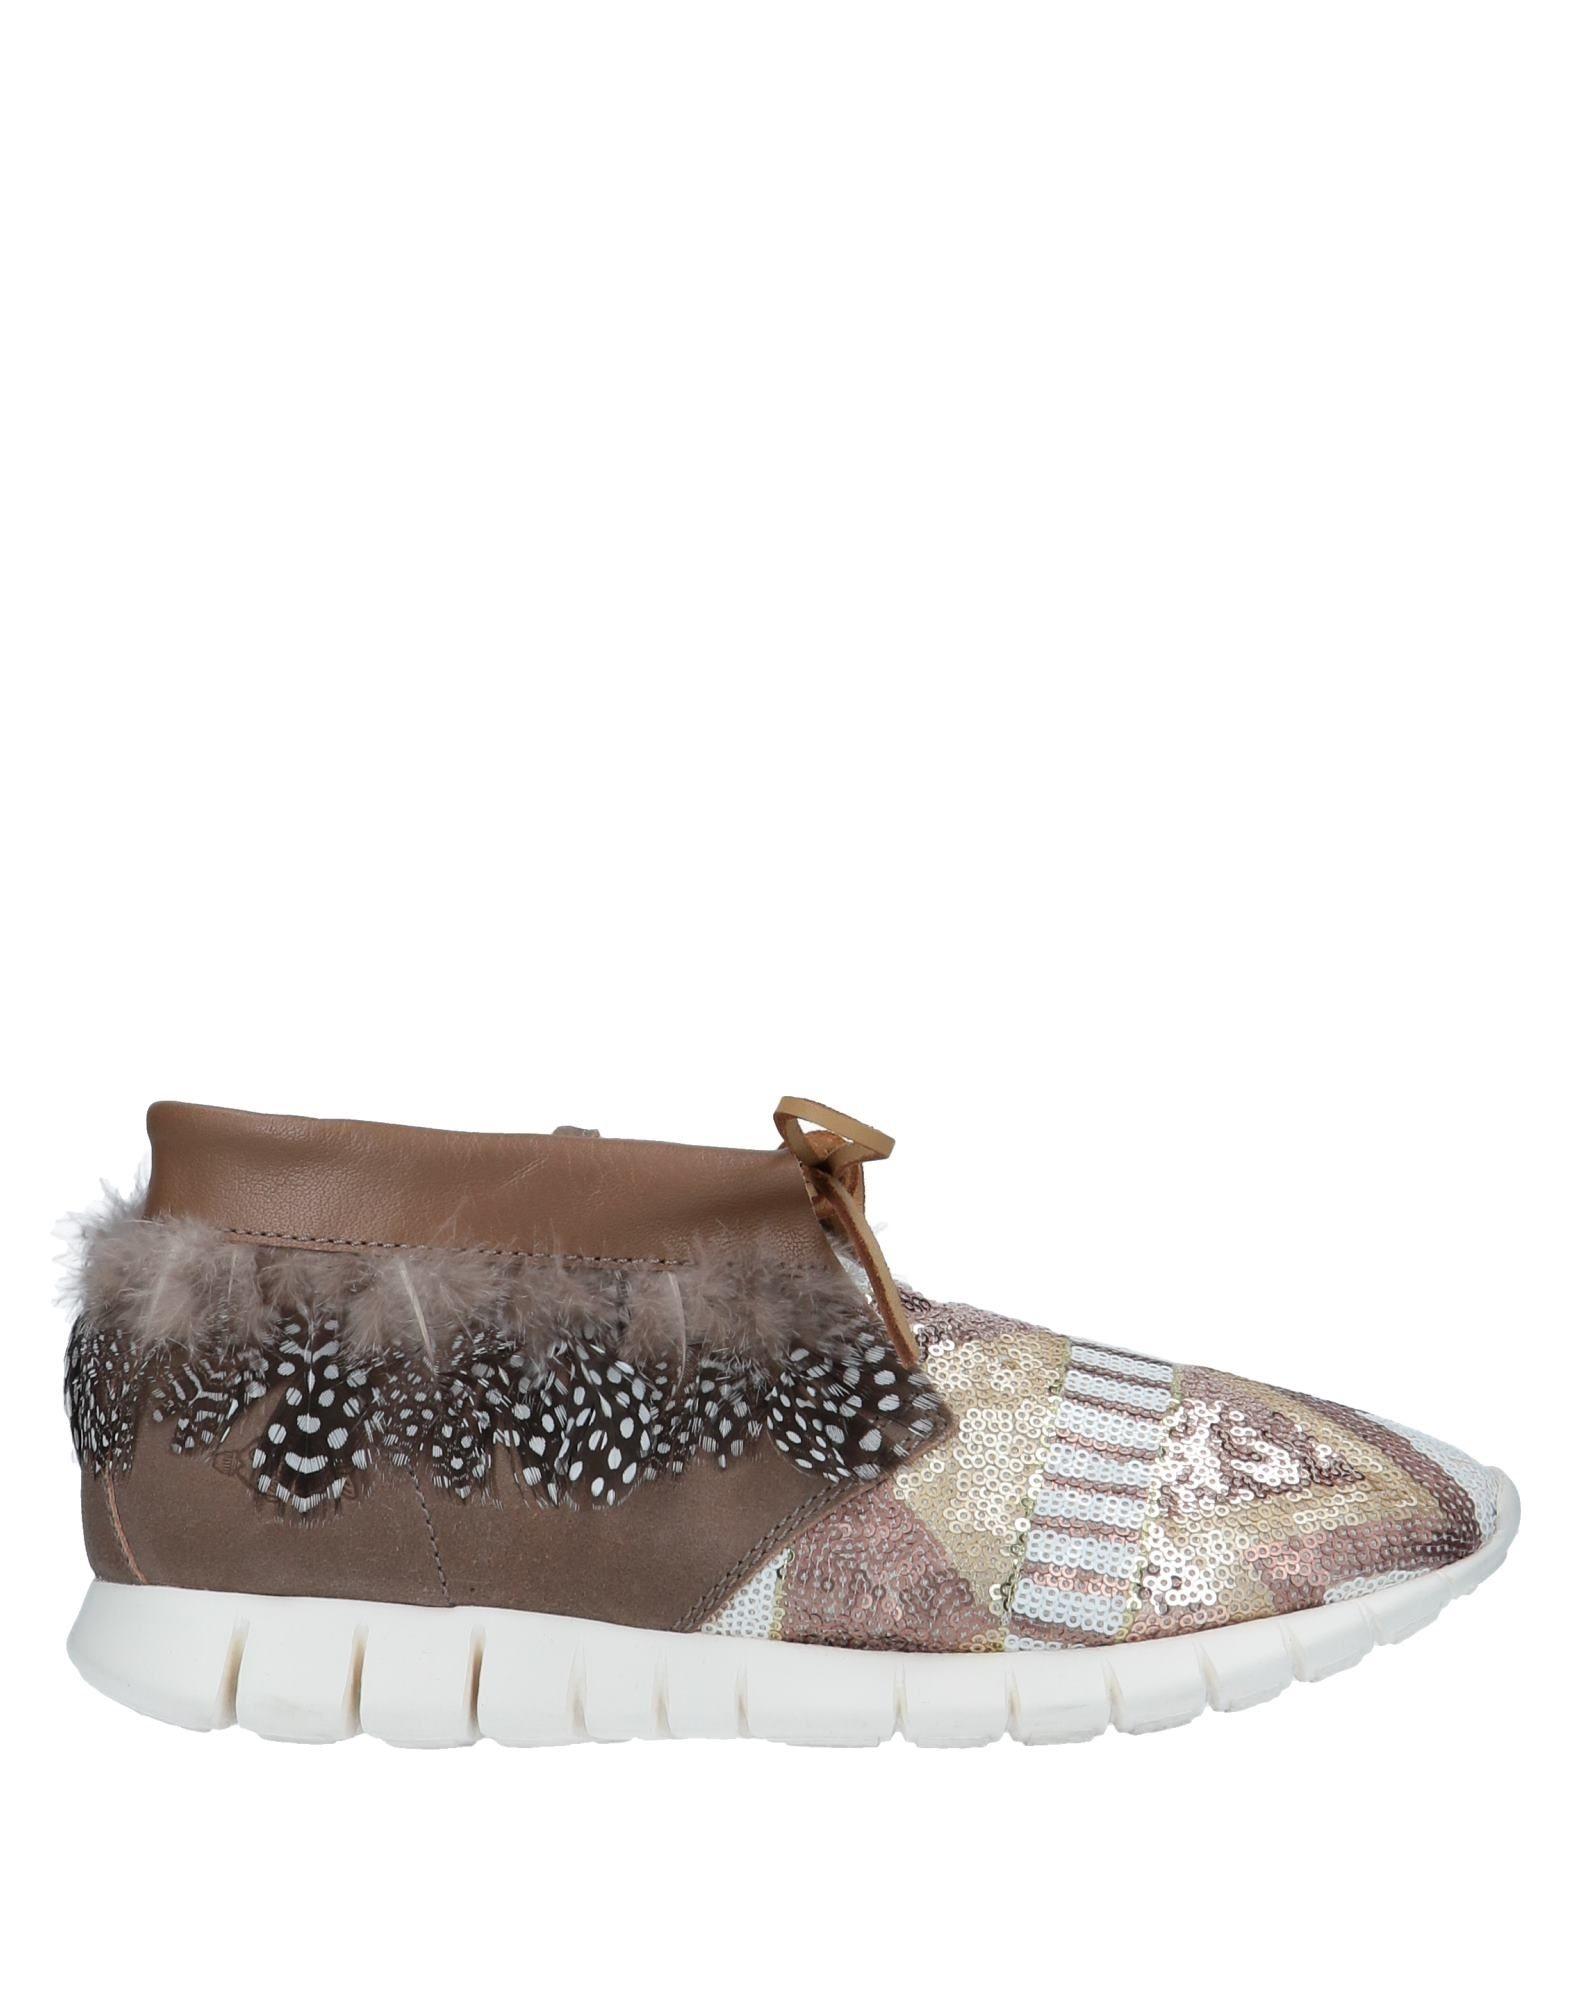 Soya Fish Fish Sneakers - Women Soya Fish Fish Sneakers online on  United Kingdom - 11561490WP 27ad07